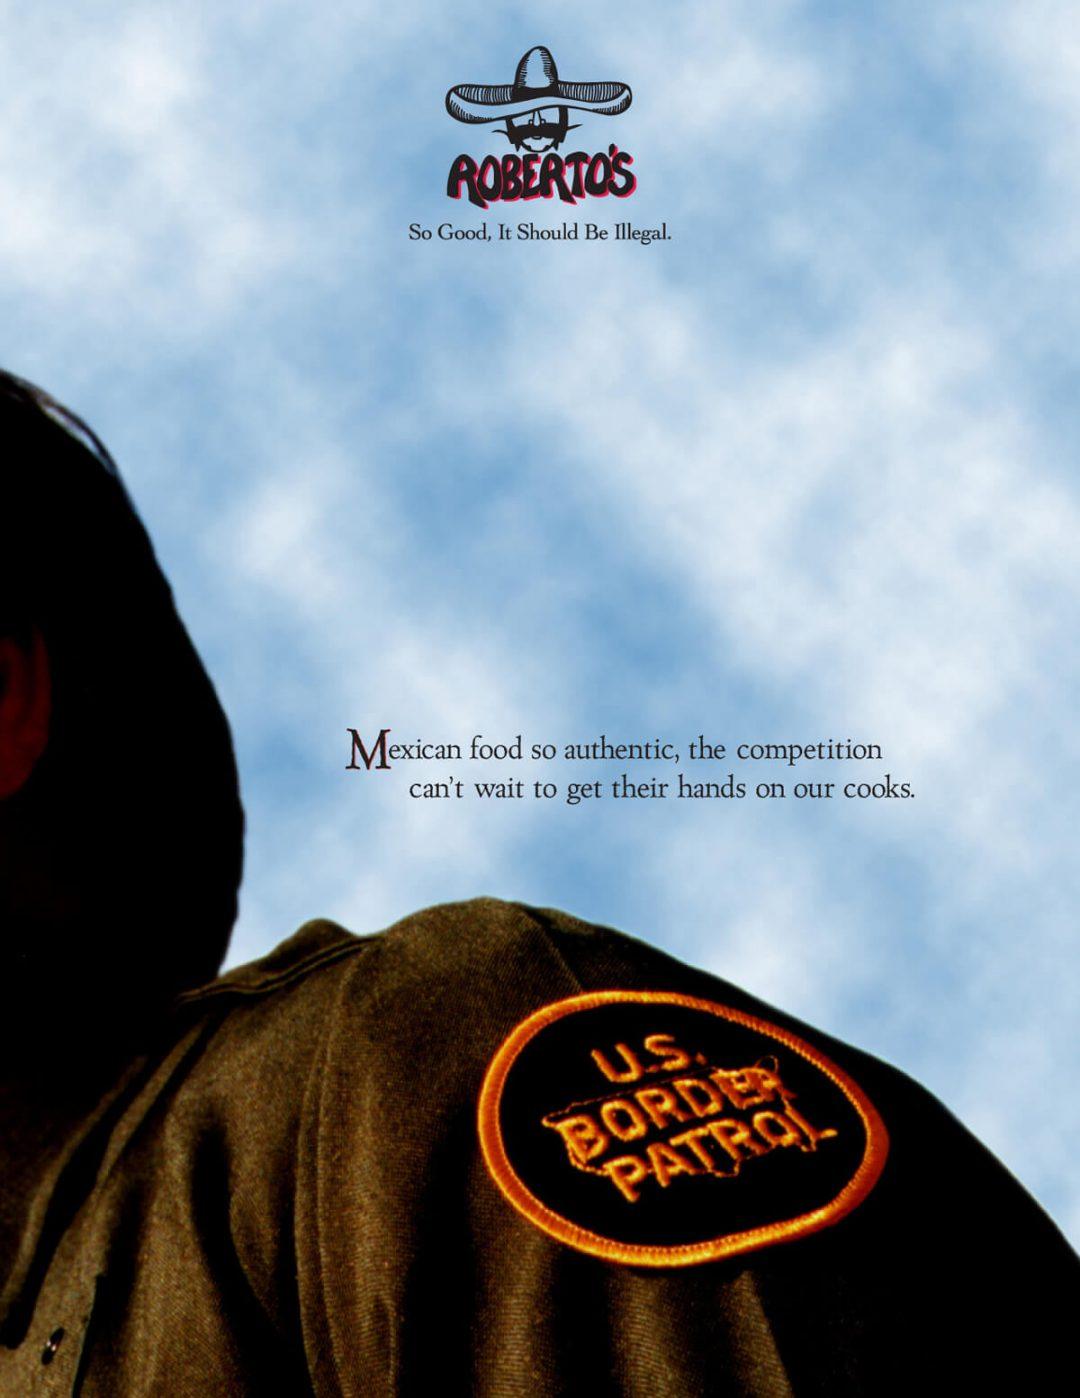 Roberto's Taco Shop Print Ad - Border Patrol